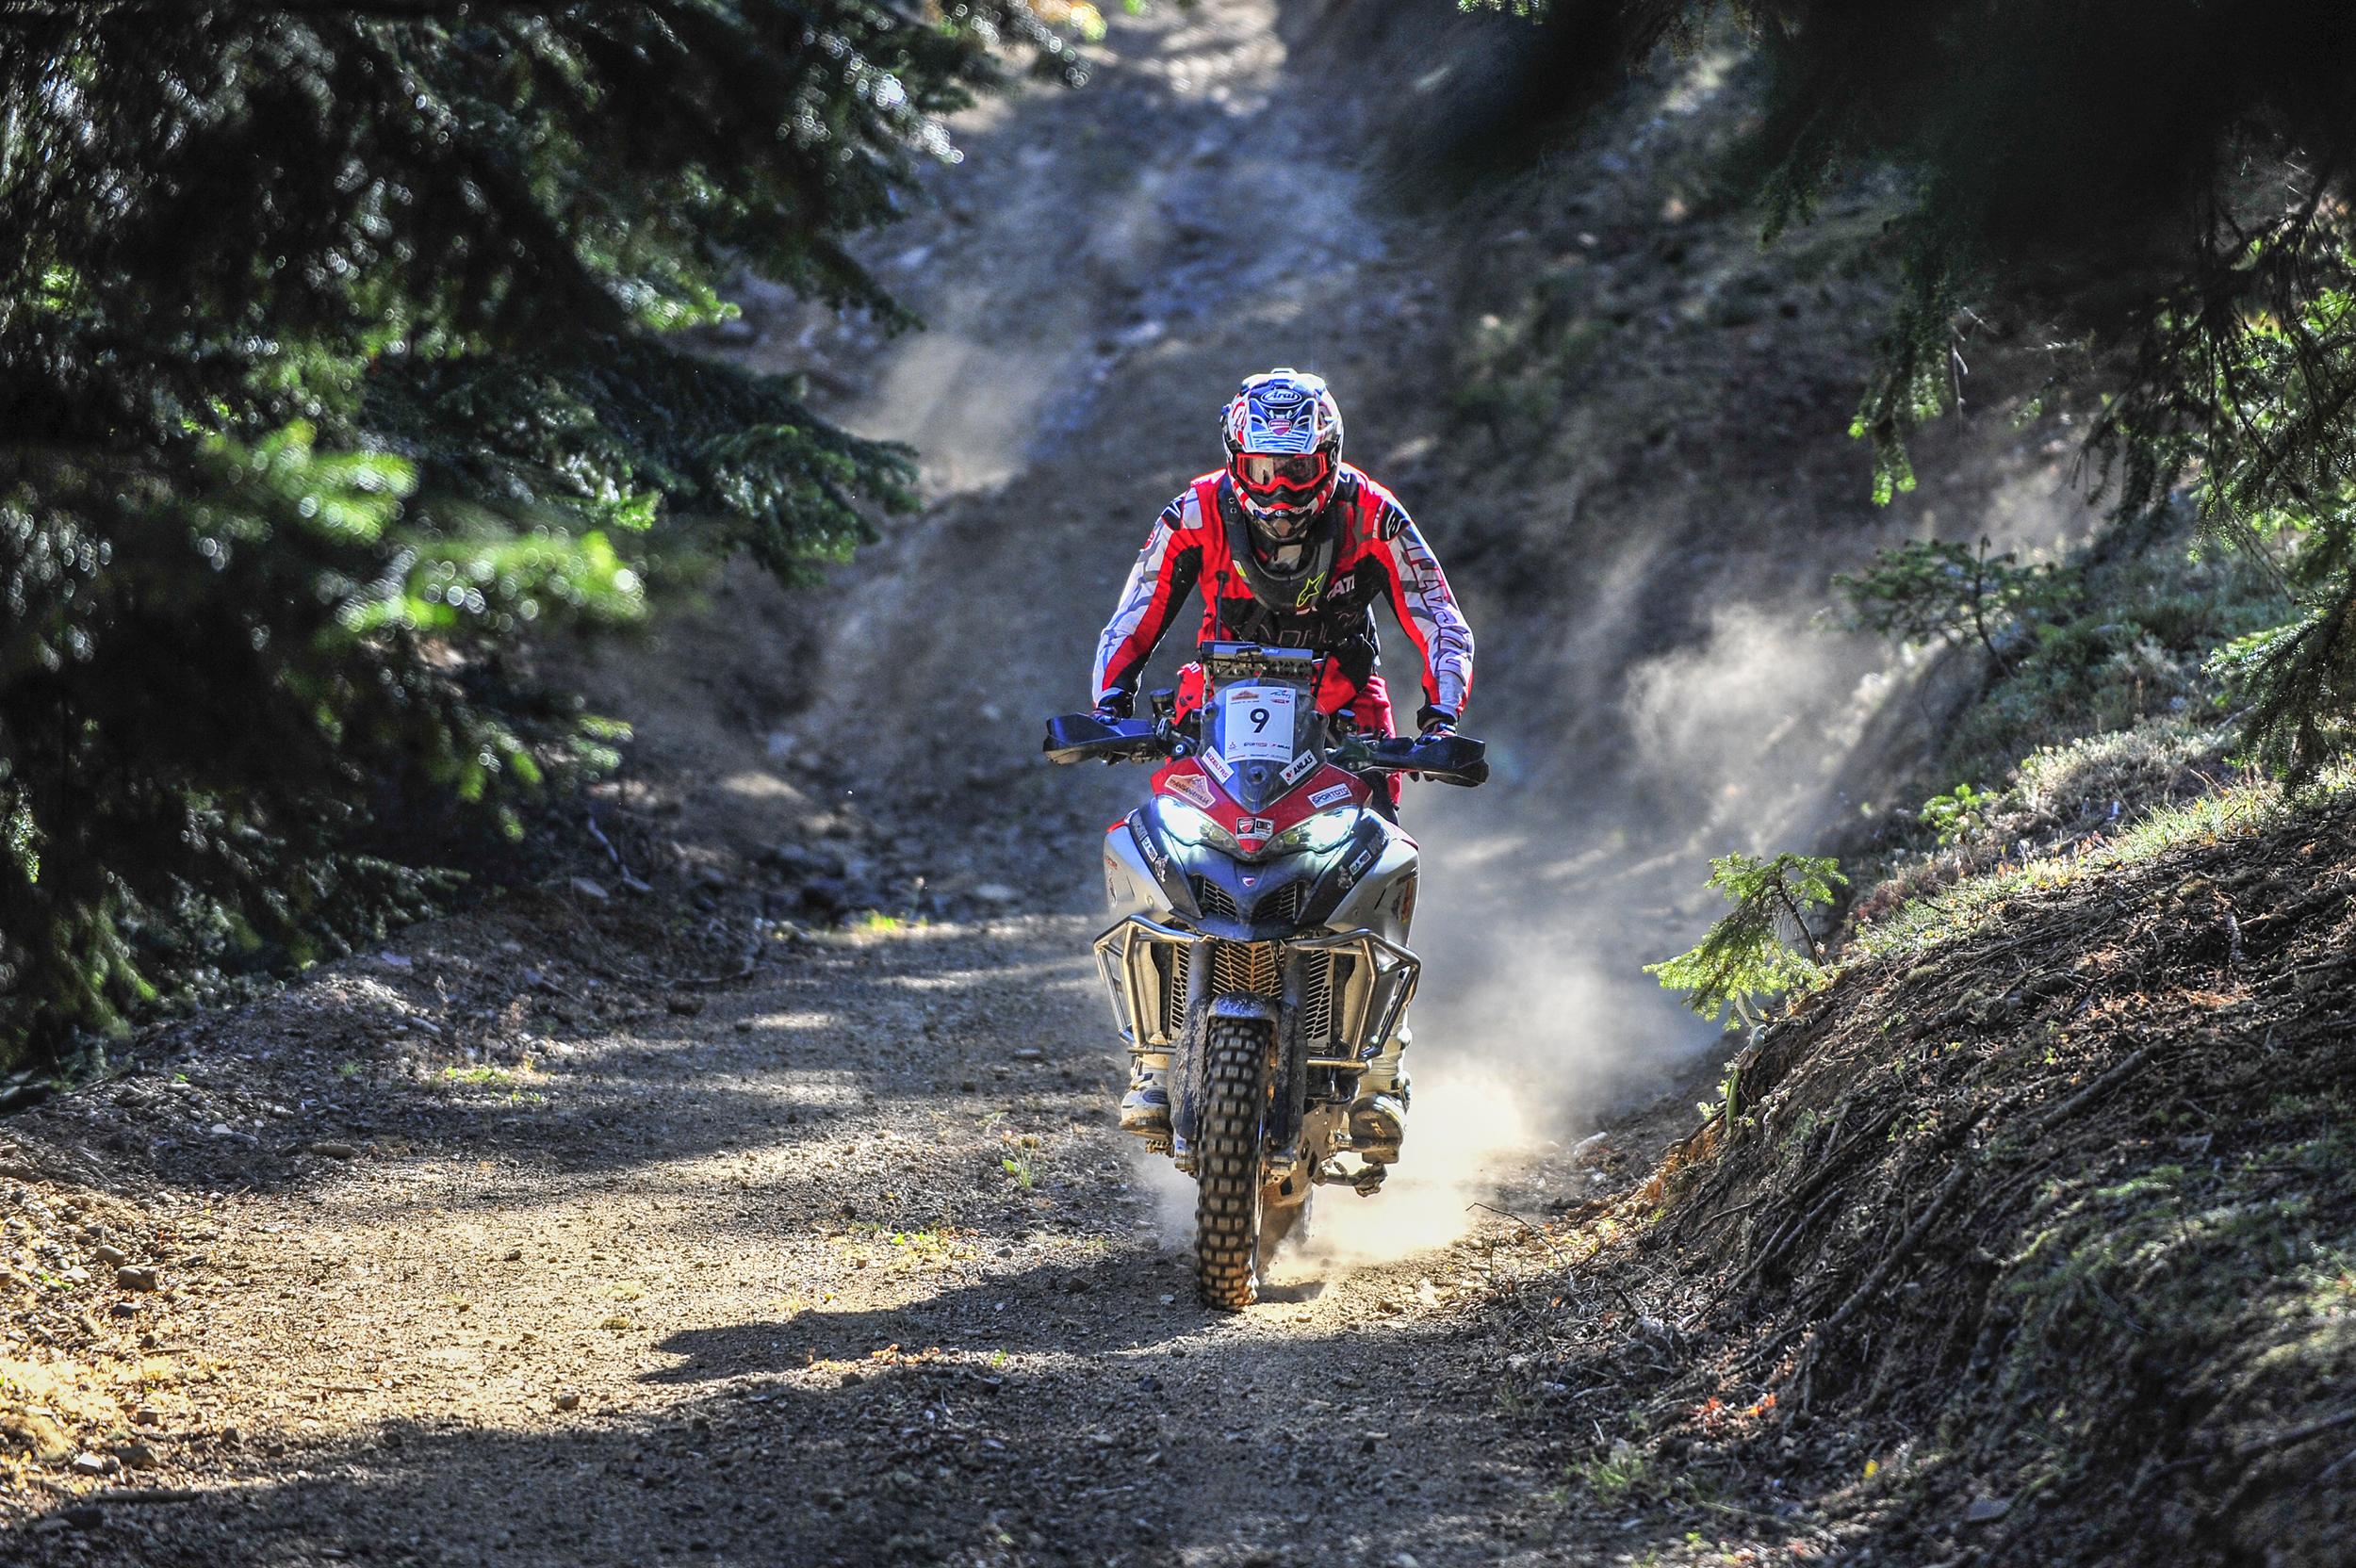 Ducati_TransanatoliaRally2020_Multistrada1260Enduro_Andrea